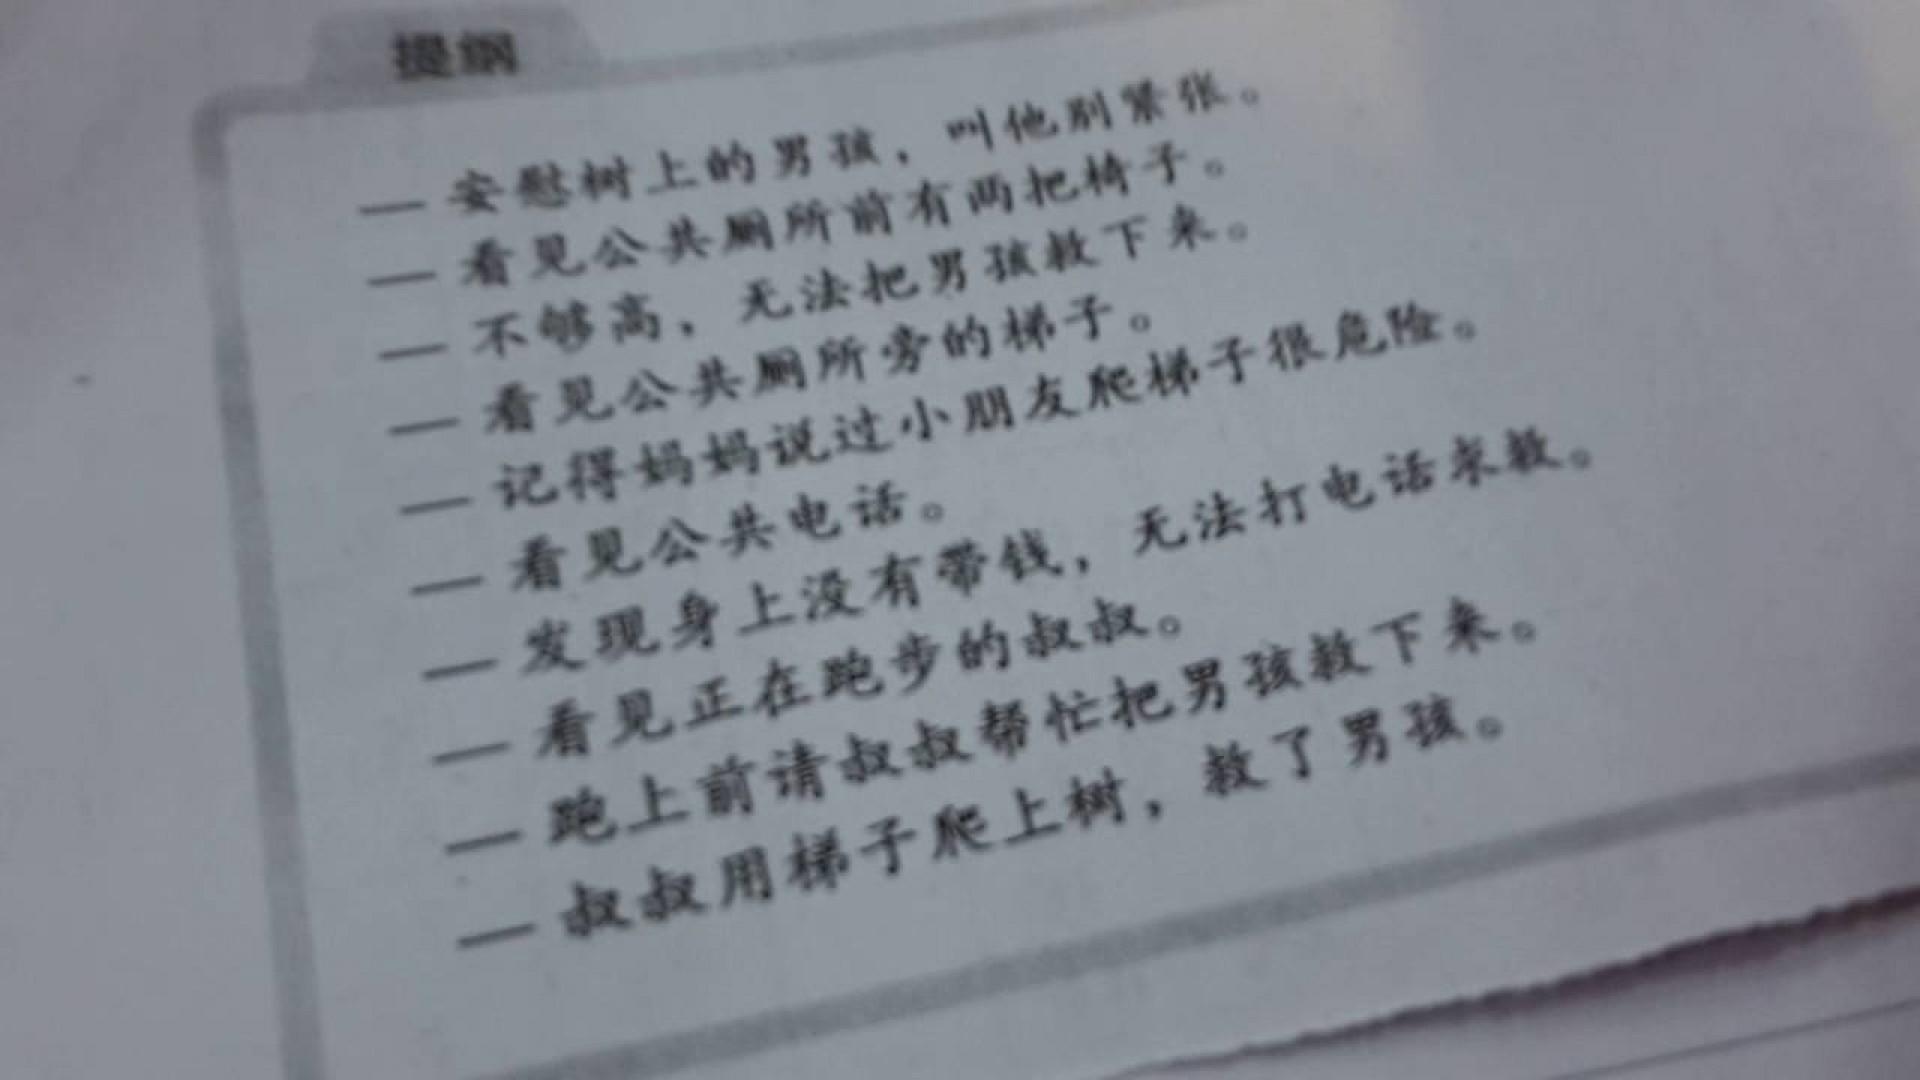 010 Essay Example Chinese Amazing Art Topics Vce Formats Sheet 1920